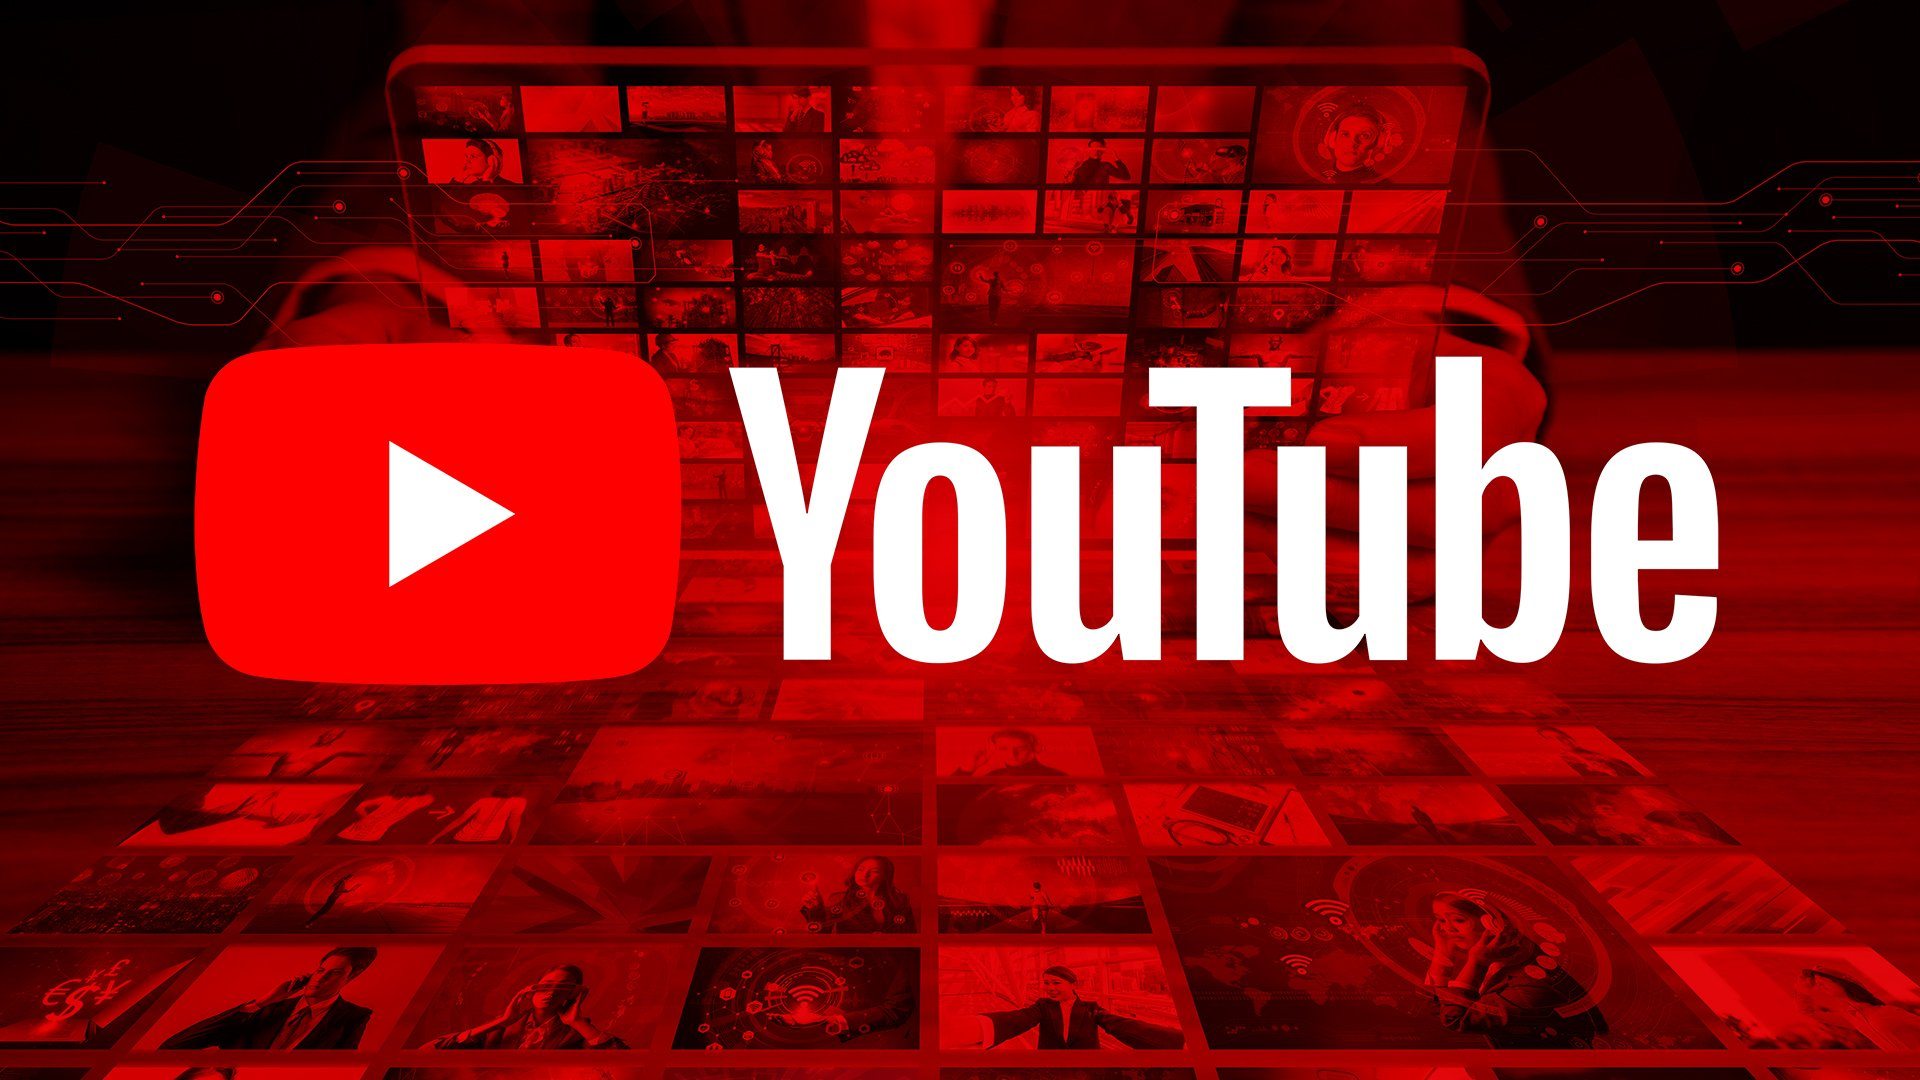 Videoplattform, Youtube, Google YouTube, YouTuber, YouTube Logo